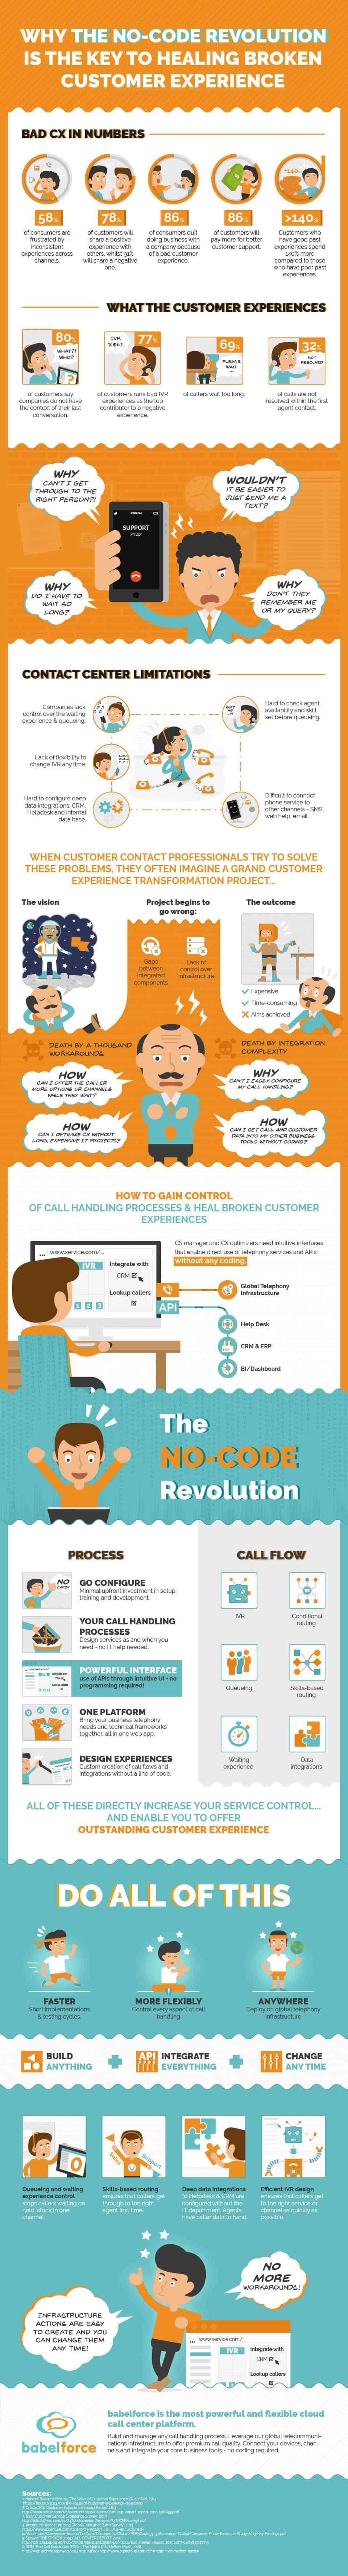 [Infographic] The NO Code Revolution: Heal Broken Customer Experiences